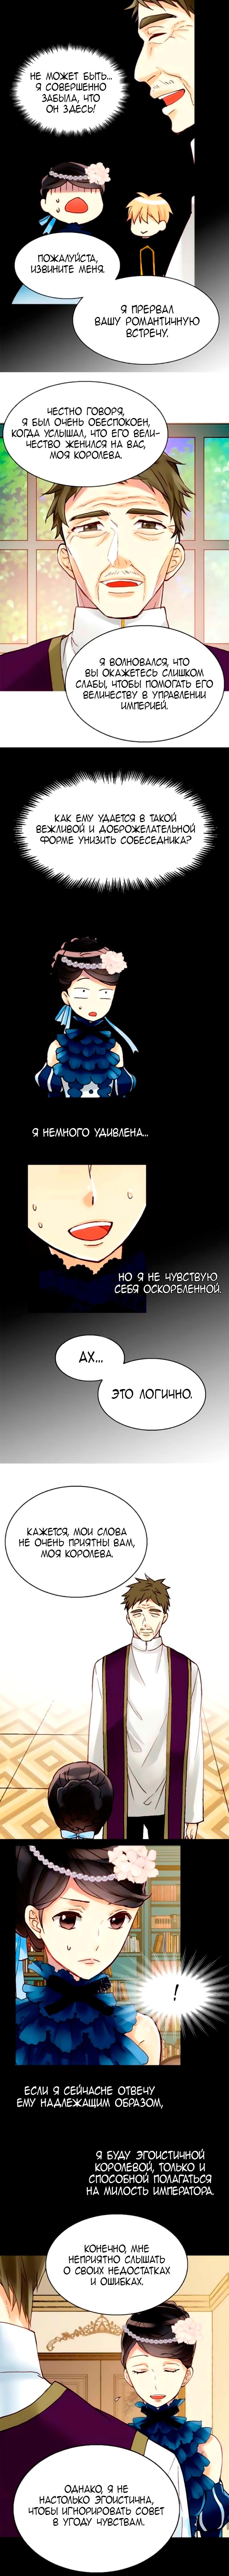 https://r2.ninemanga.com/comics/pic3/14/22798/1314937/1550320336741.jpg Page 3